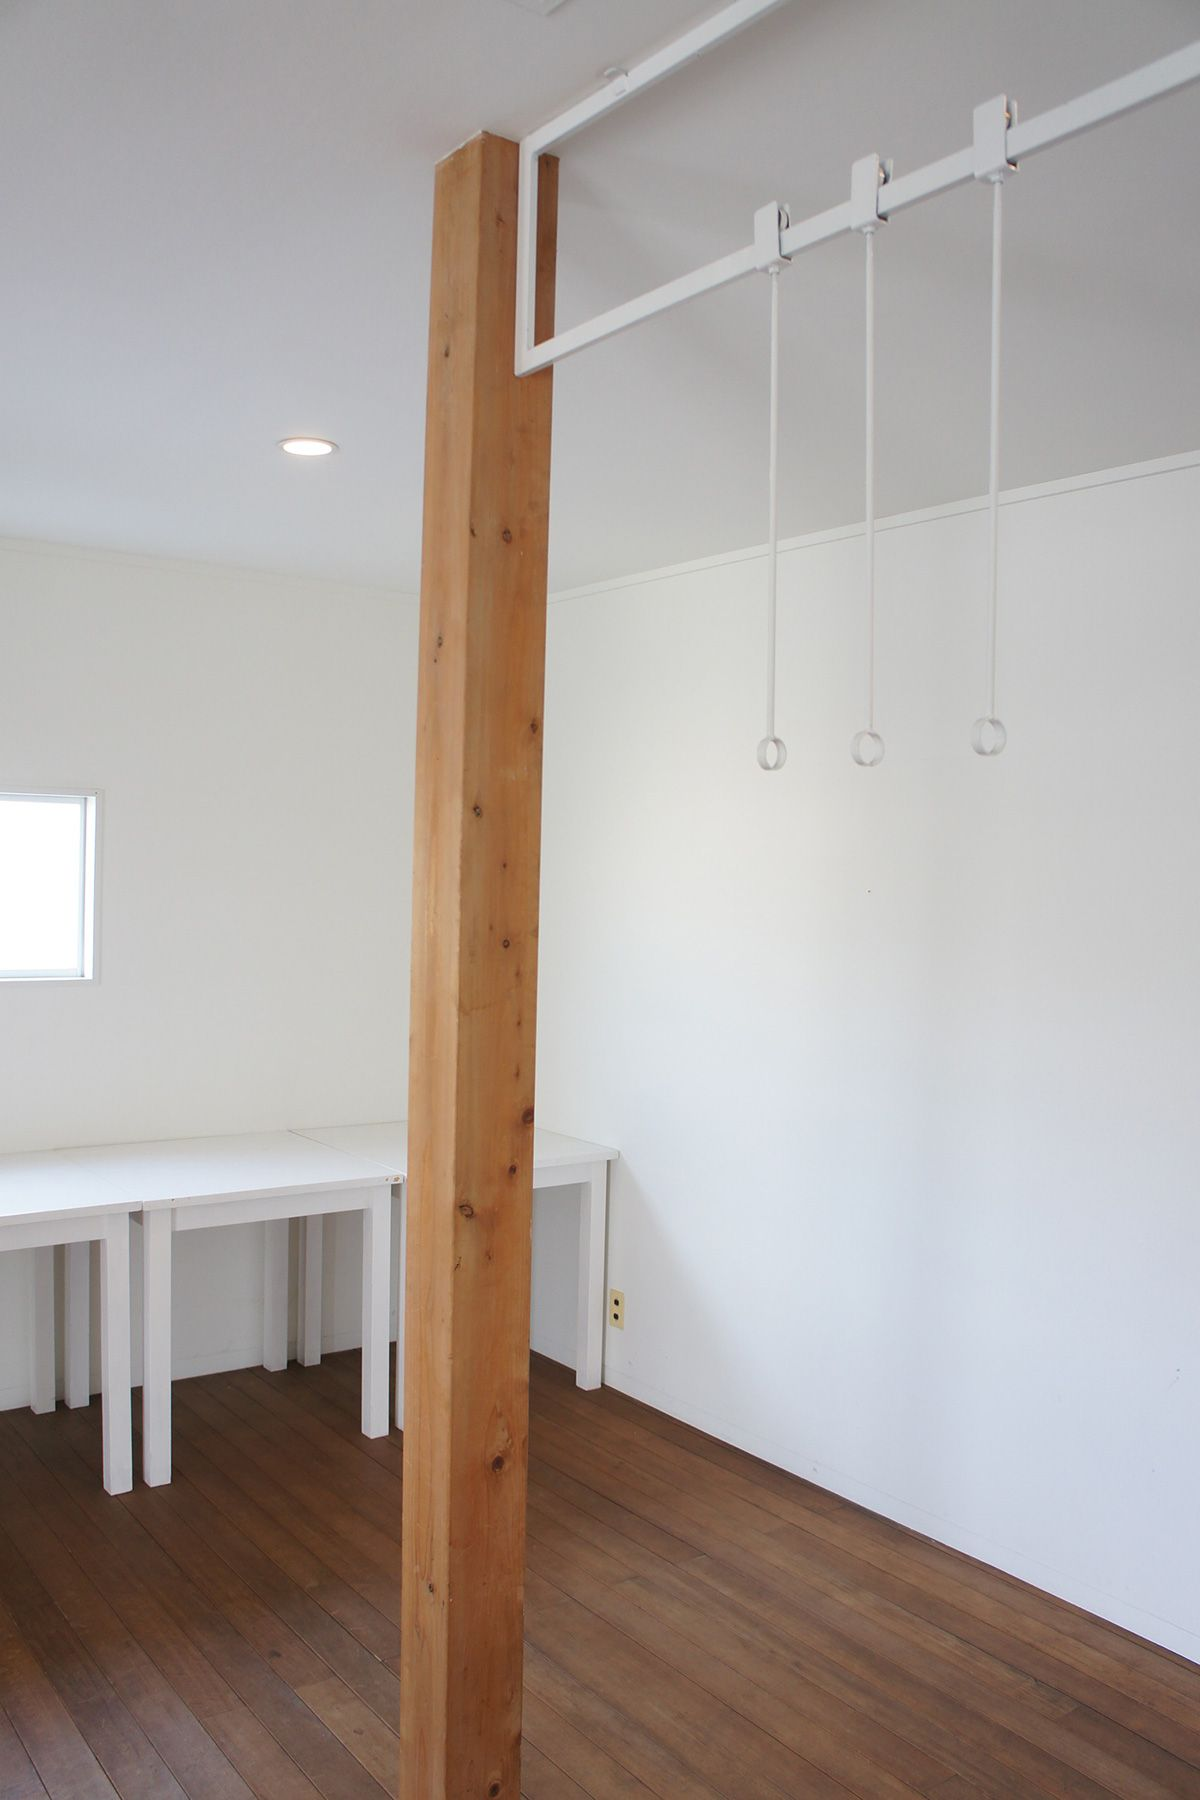 cimai/yuzuri(シマイ/ユズリ) パン屋&ギャラリー&アトリエcimai_2F